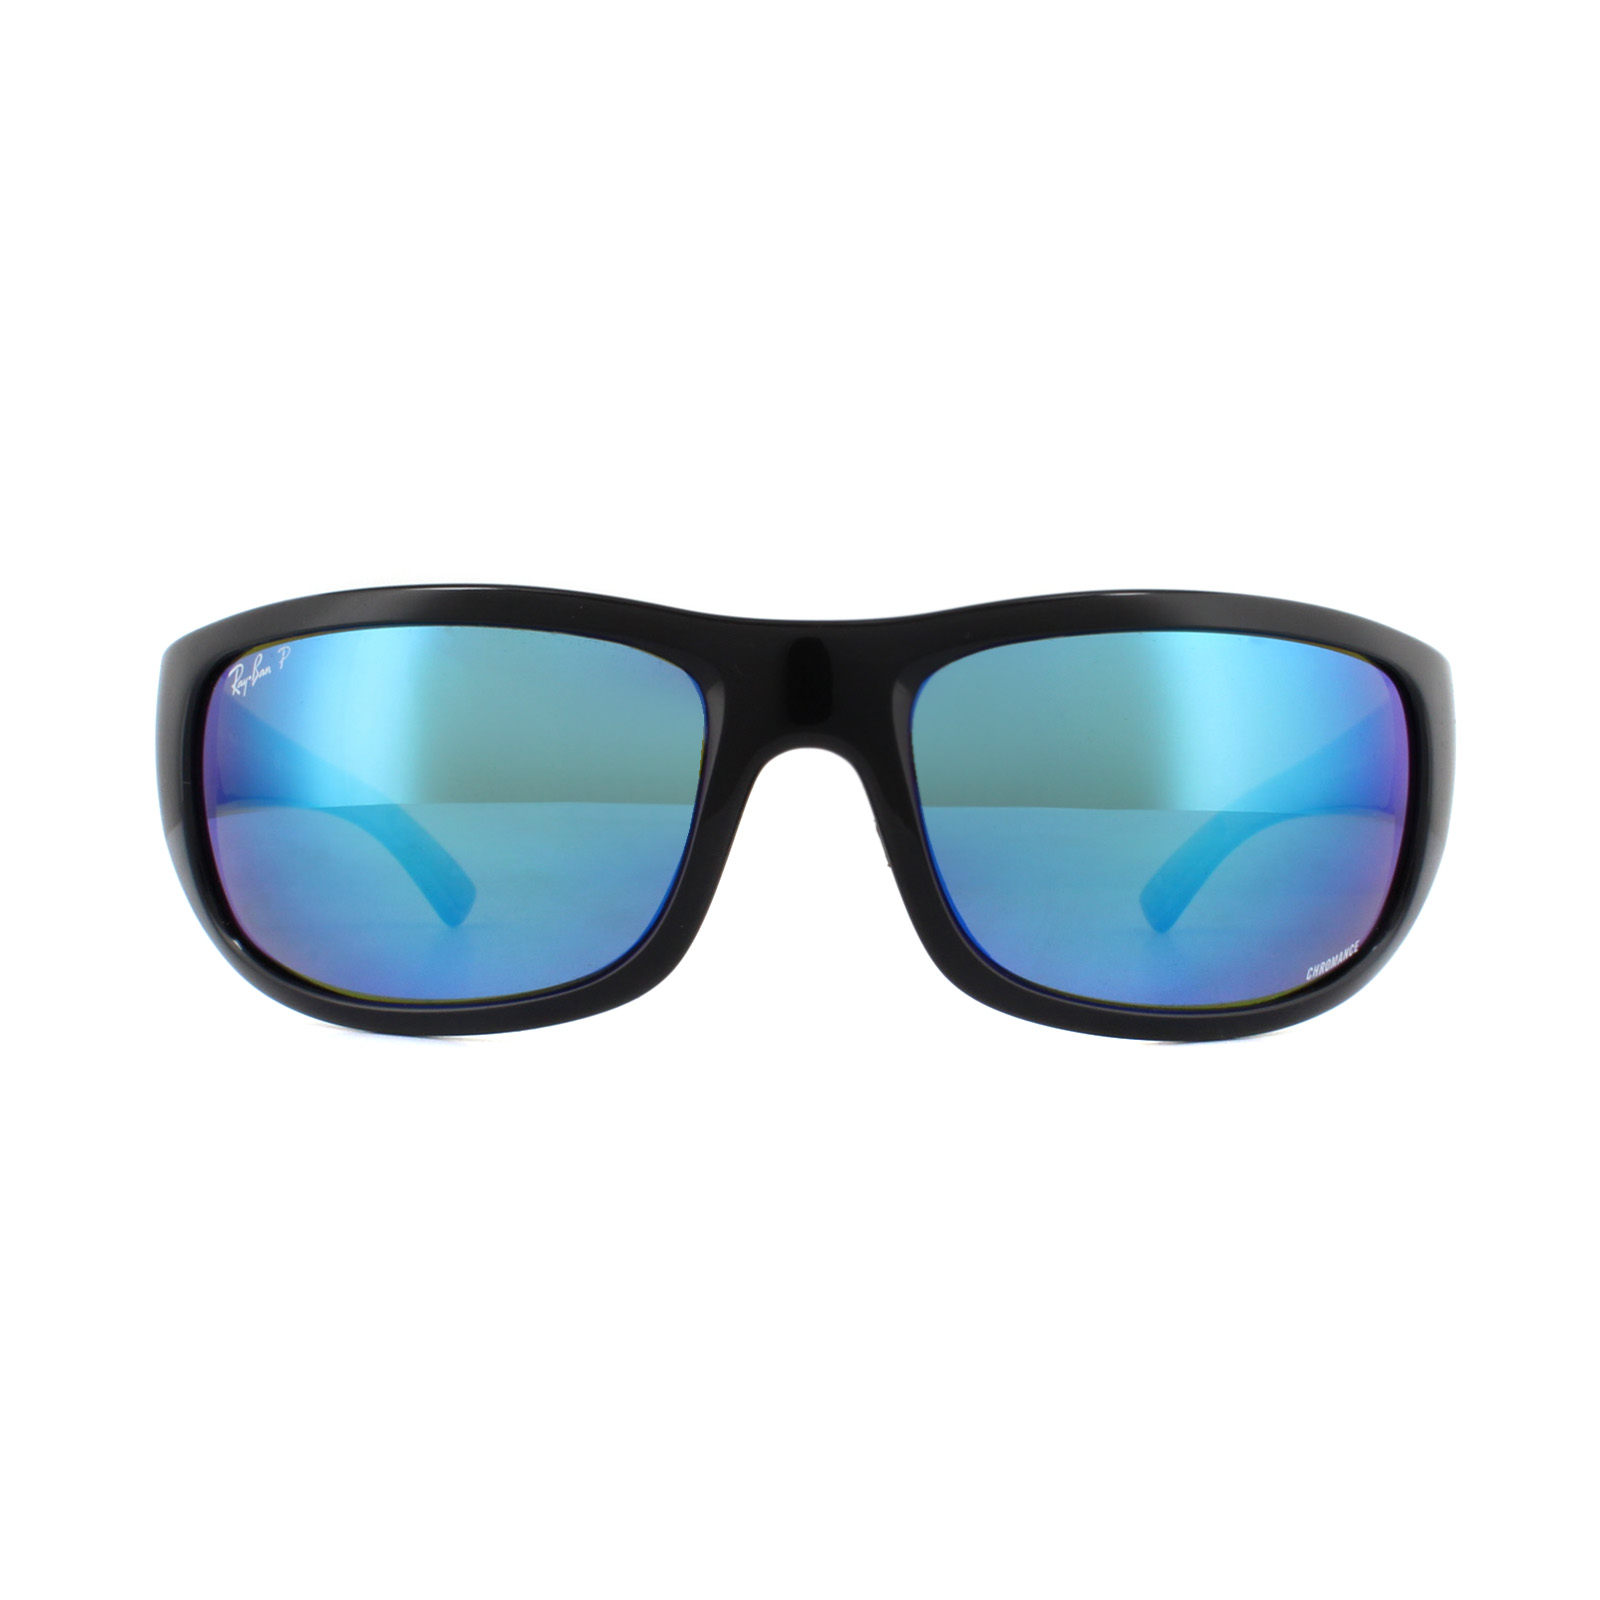 b1b4dfea18 Sentinel Ray-Ban Sunglasses 4283CH Chromance 601 A1 Black Blue Mirror  Polarized